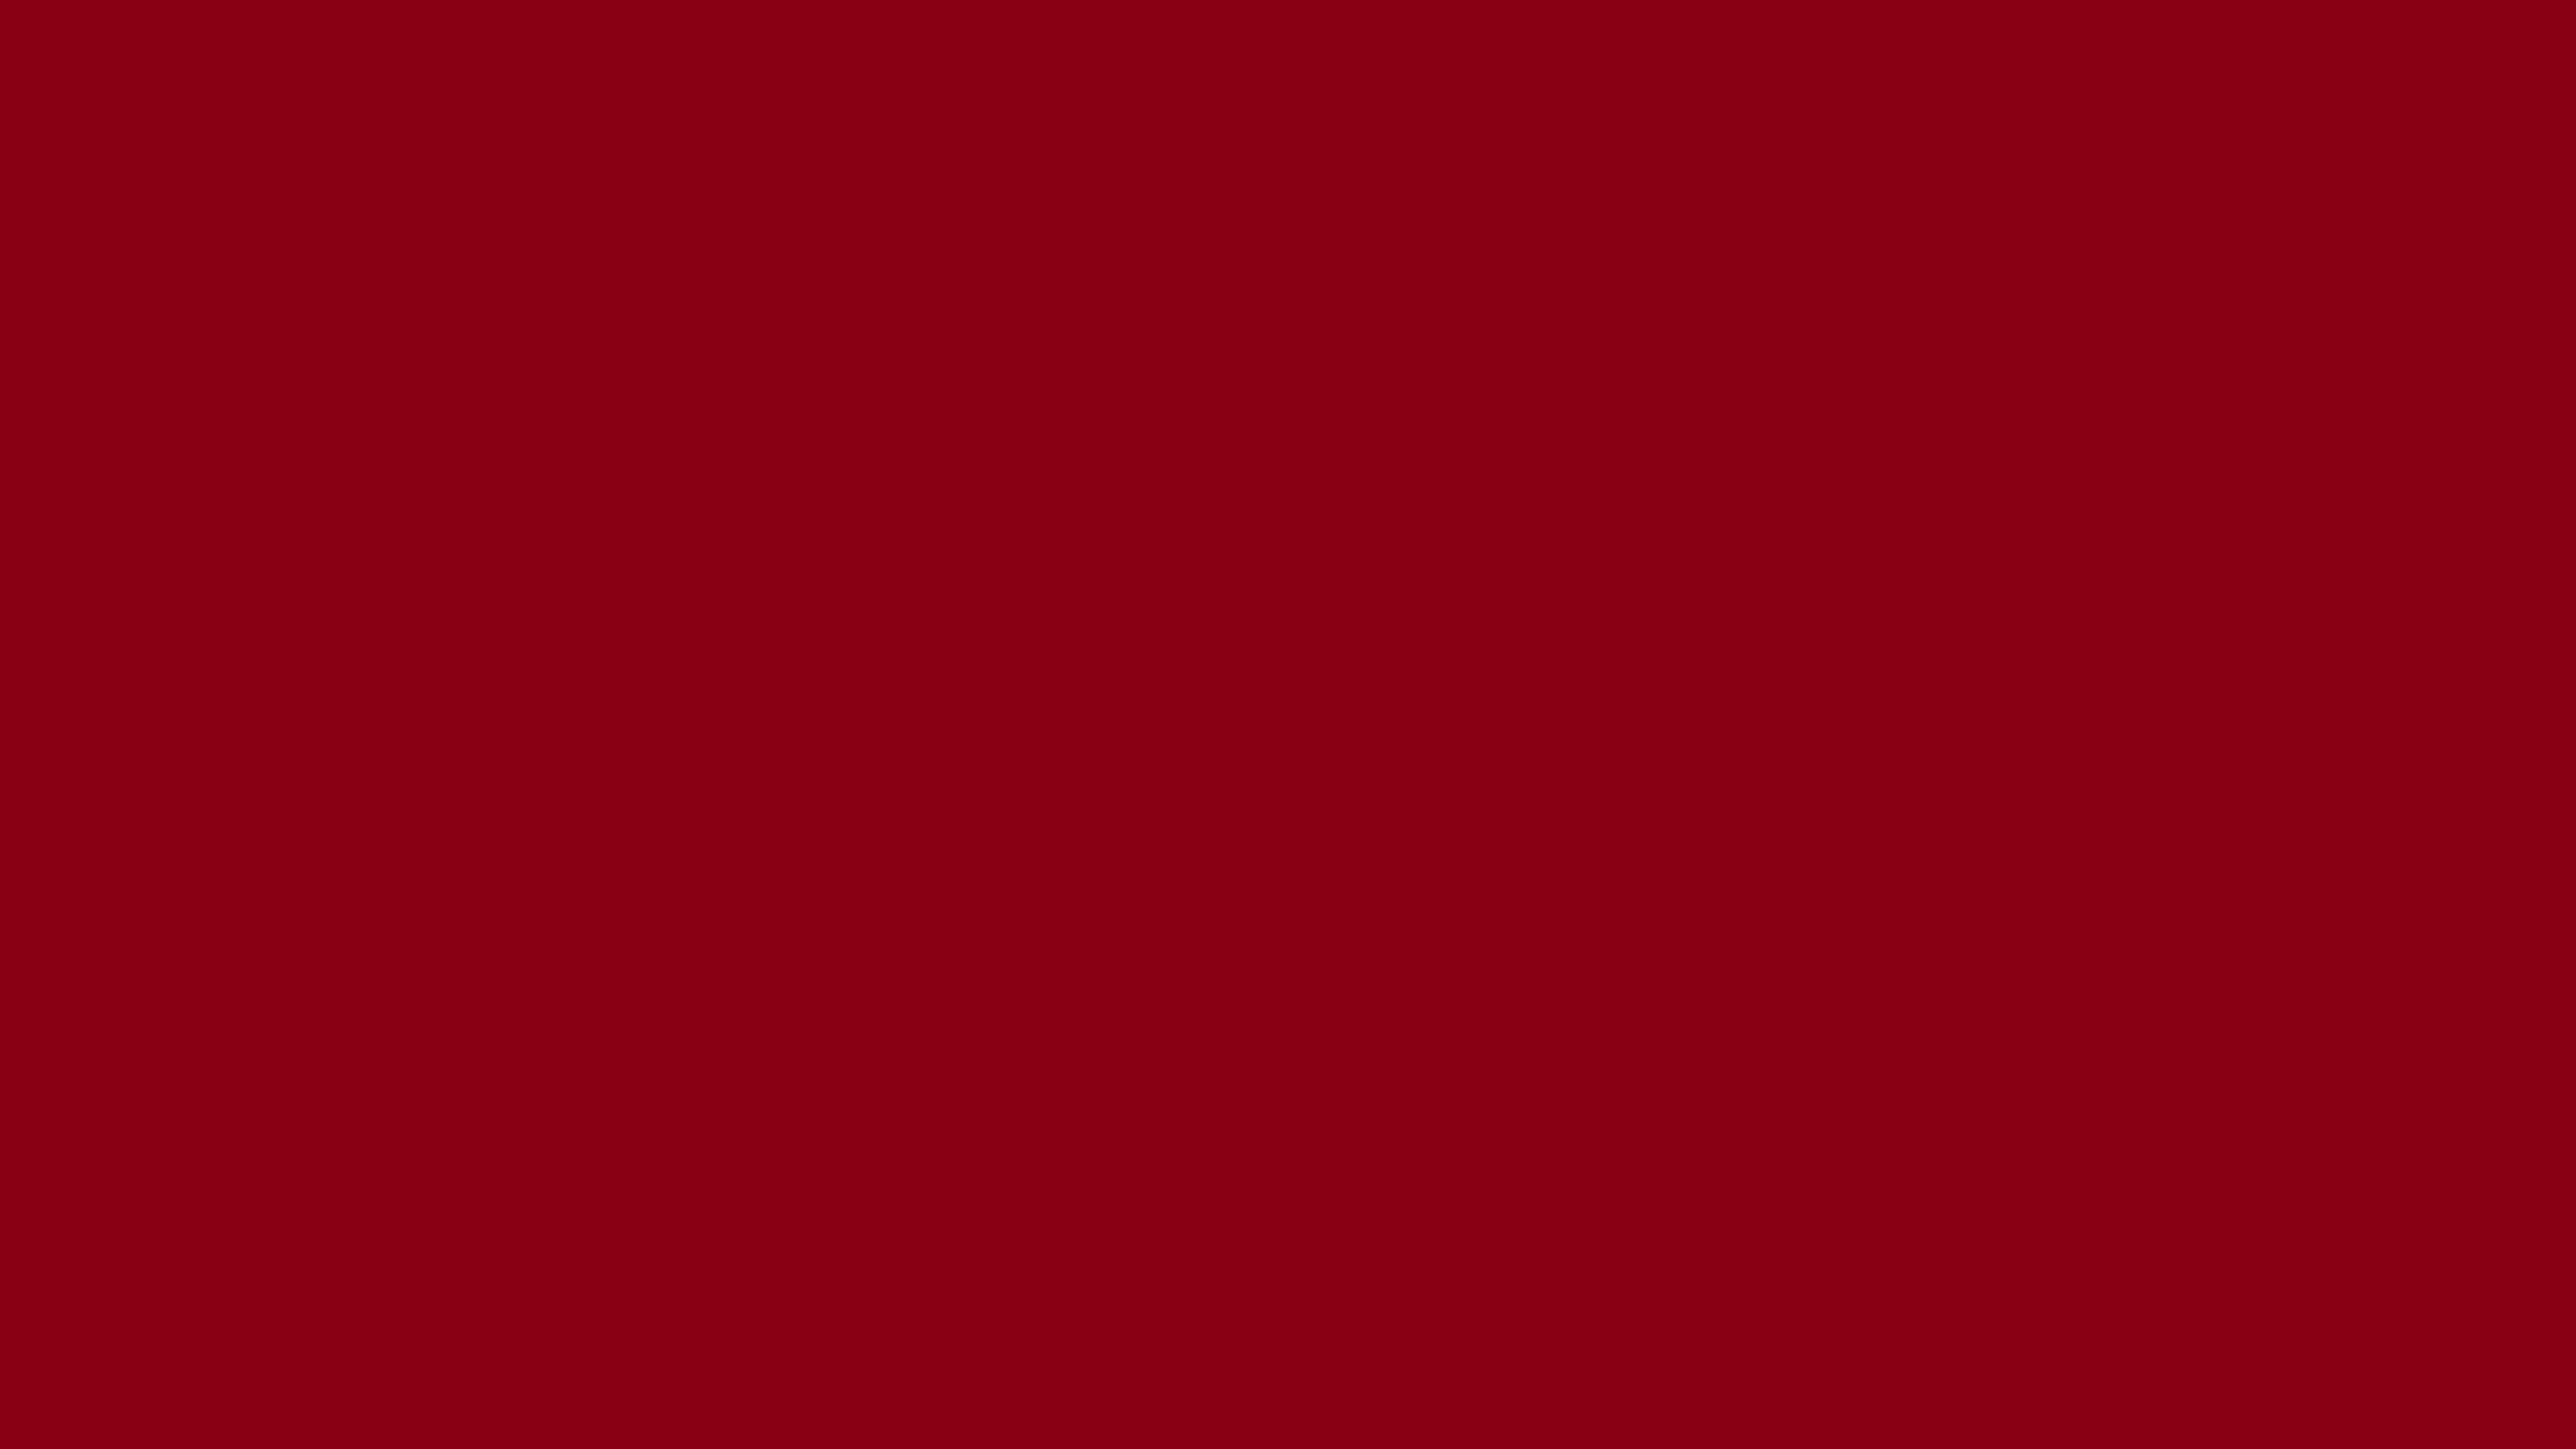 3840x2160 Red Devil Solid Color Background